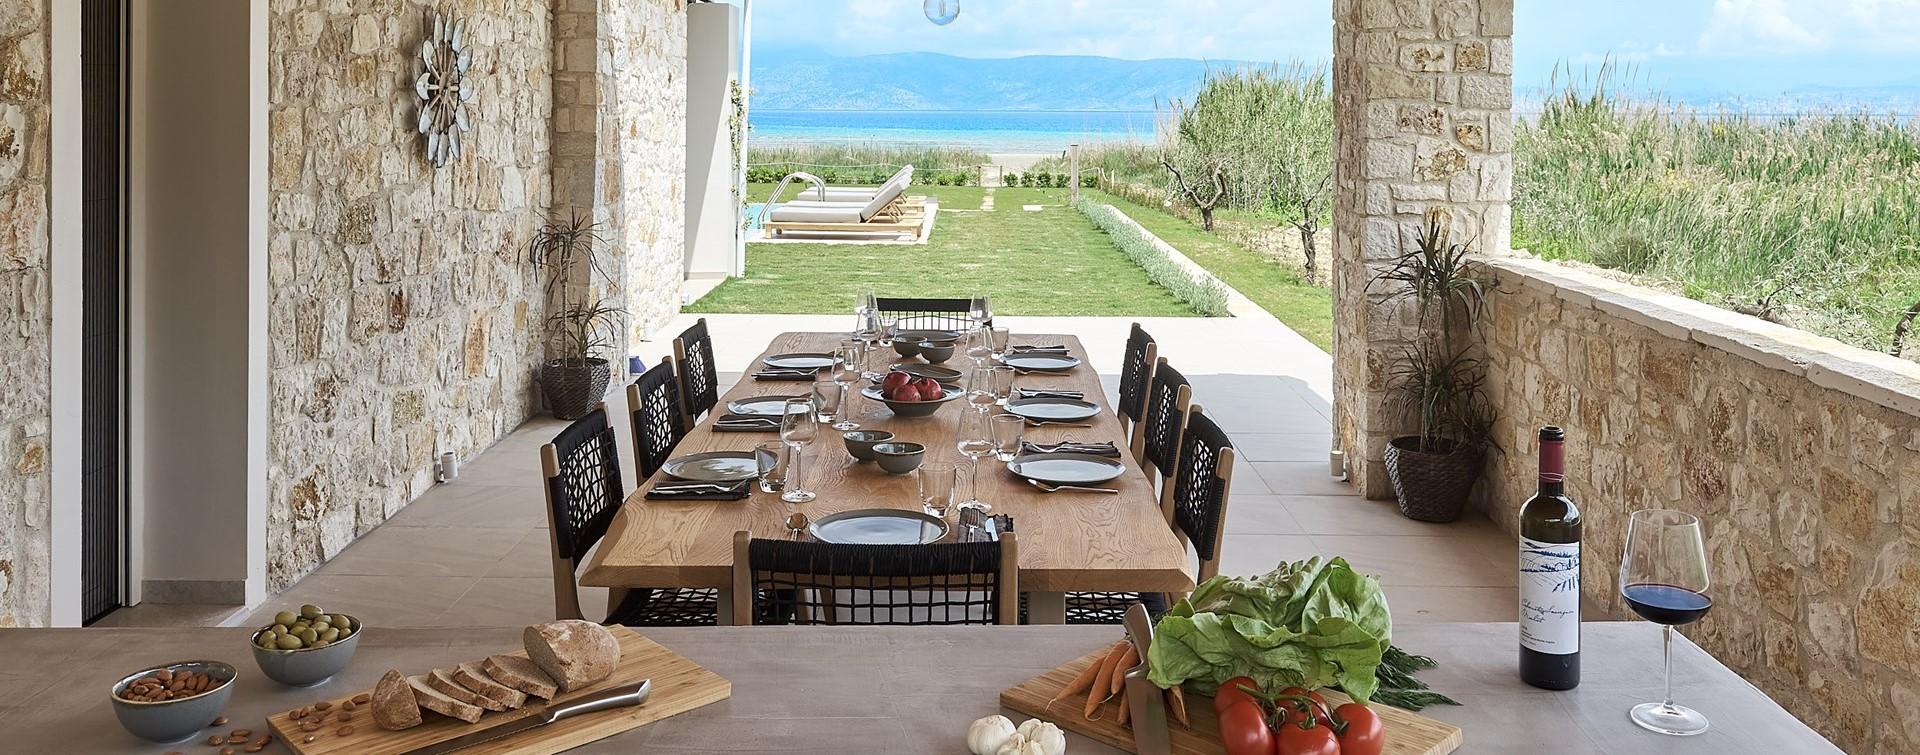 nero-beach-house-corfu-dining-terrace